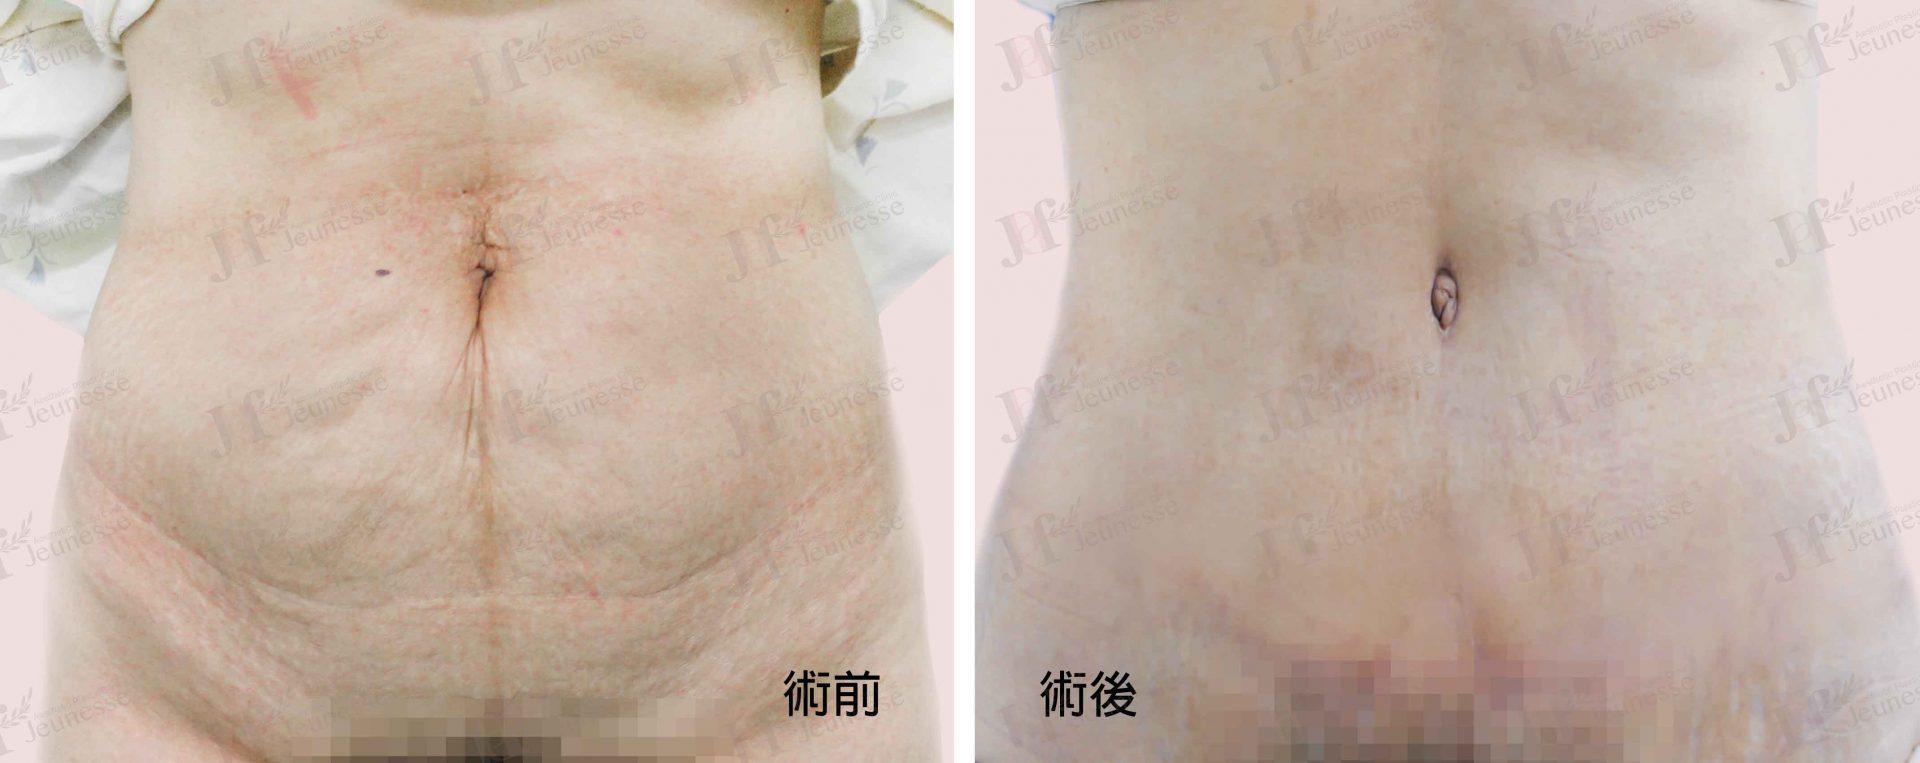 Abdominoplasty腹部成形術及抽脂手術 case 1 正面-浮水印